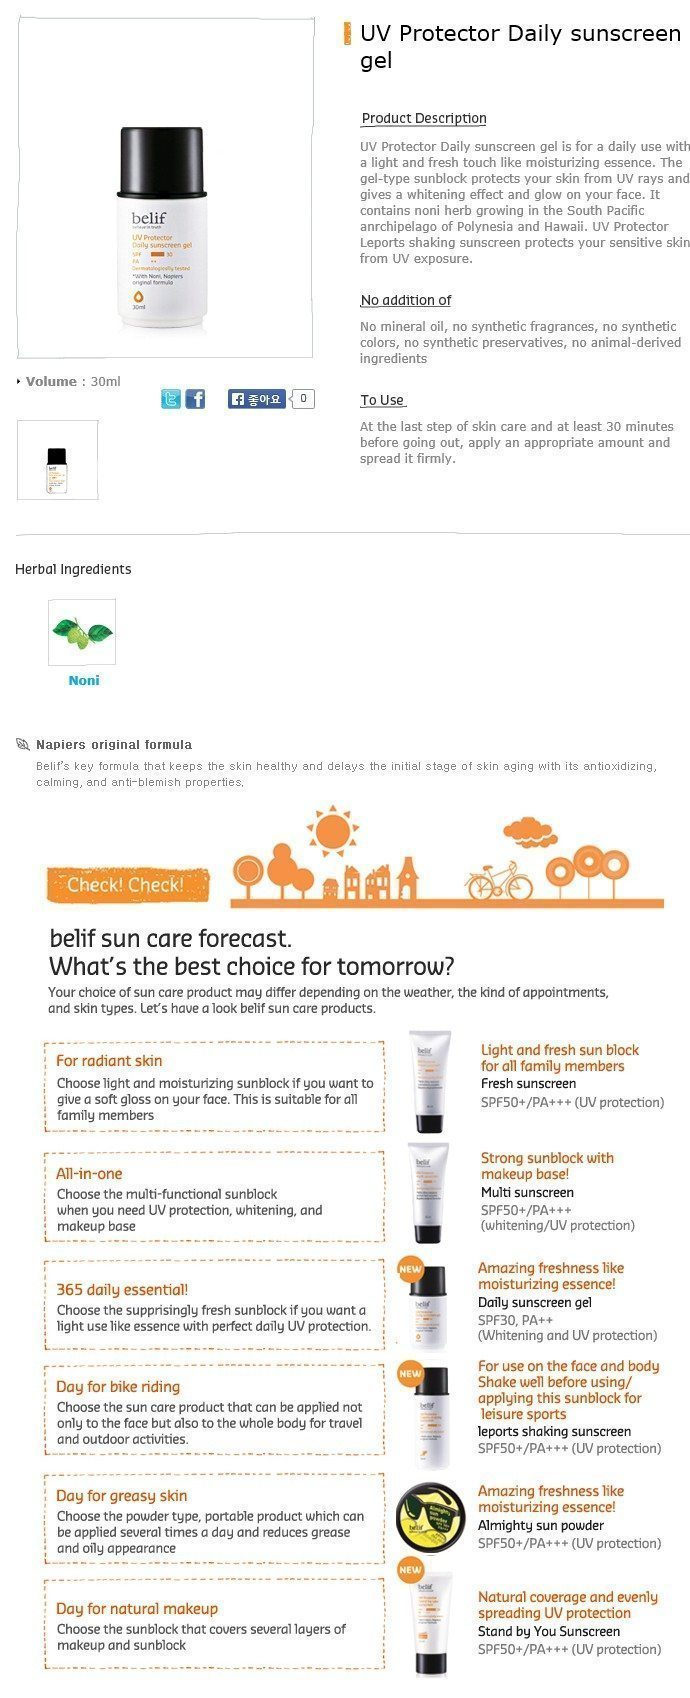 Belif UV Protector Daily Sunscreen Gel SPF 50+ PA++ 30ml